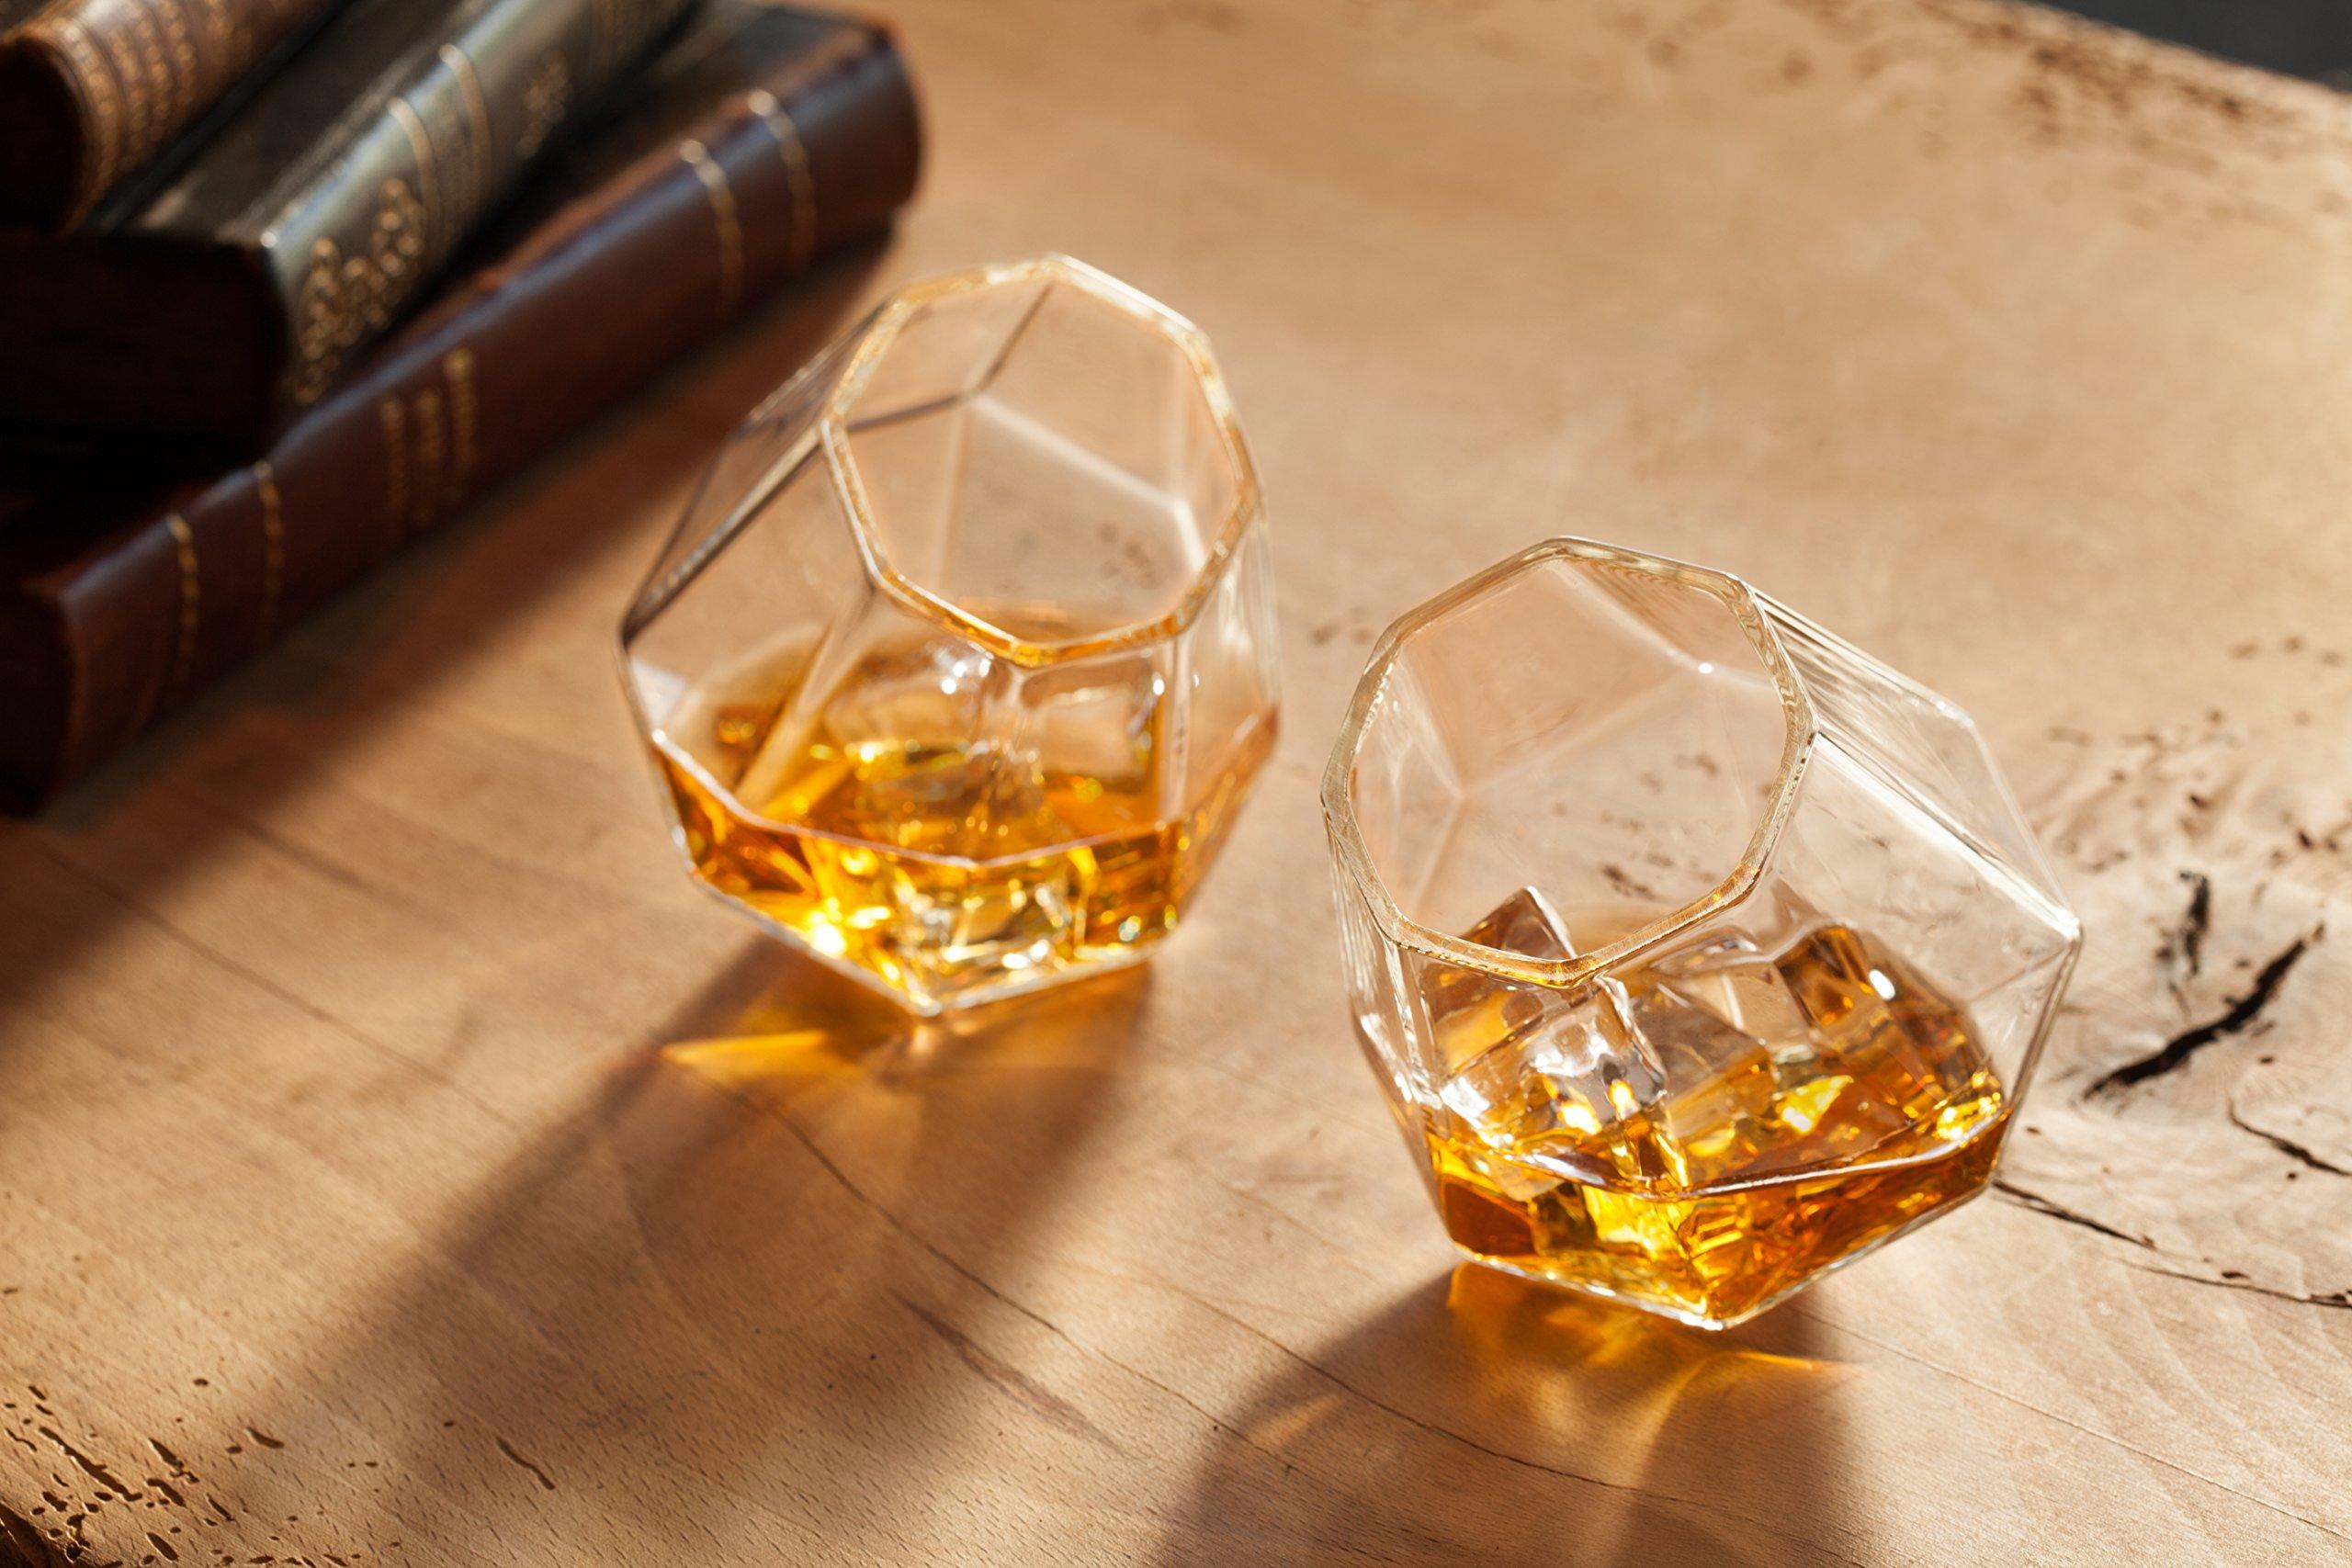 Dragon Glassware Diamond Whiskey Glasses, Premium Designer Tumblers for Spirits and Wine, 10-Ounces, Gift Boxed - Set of 4 by Dragon Glassware (Image #2)